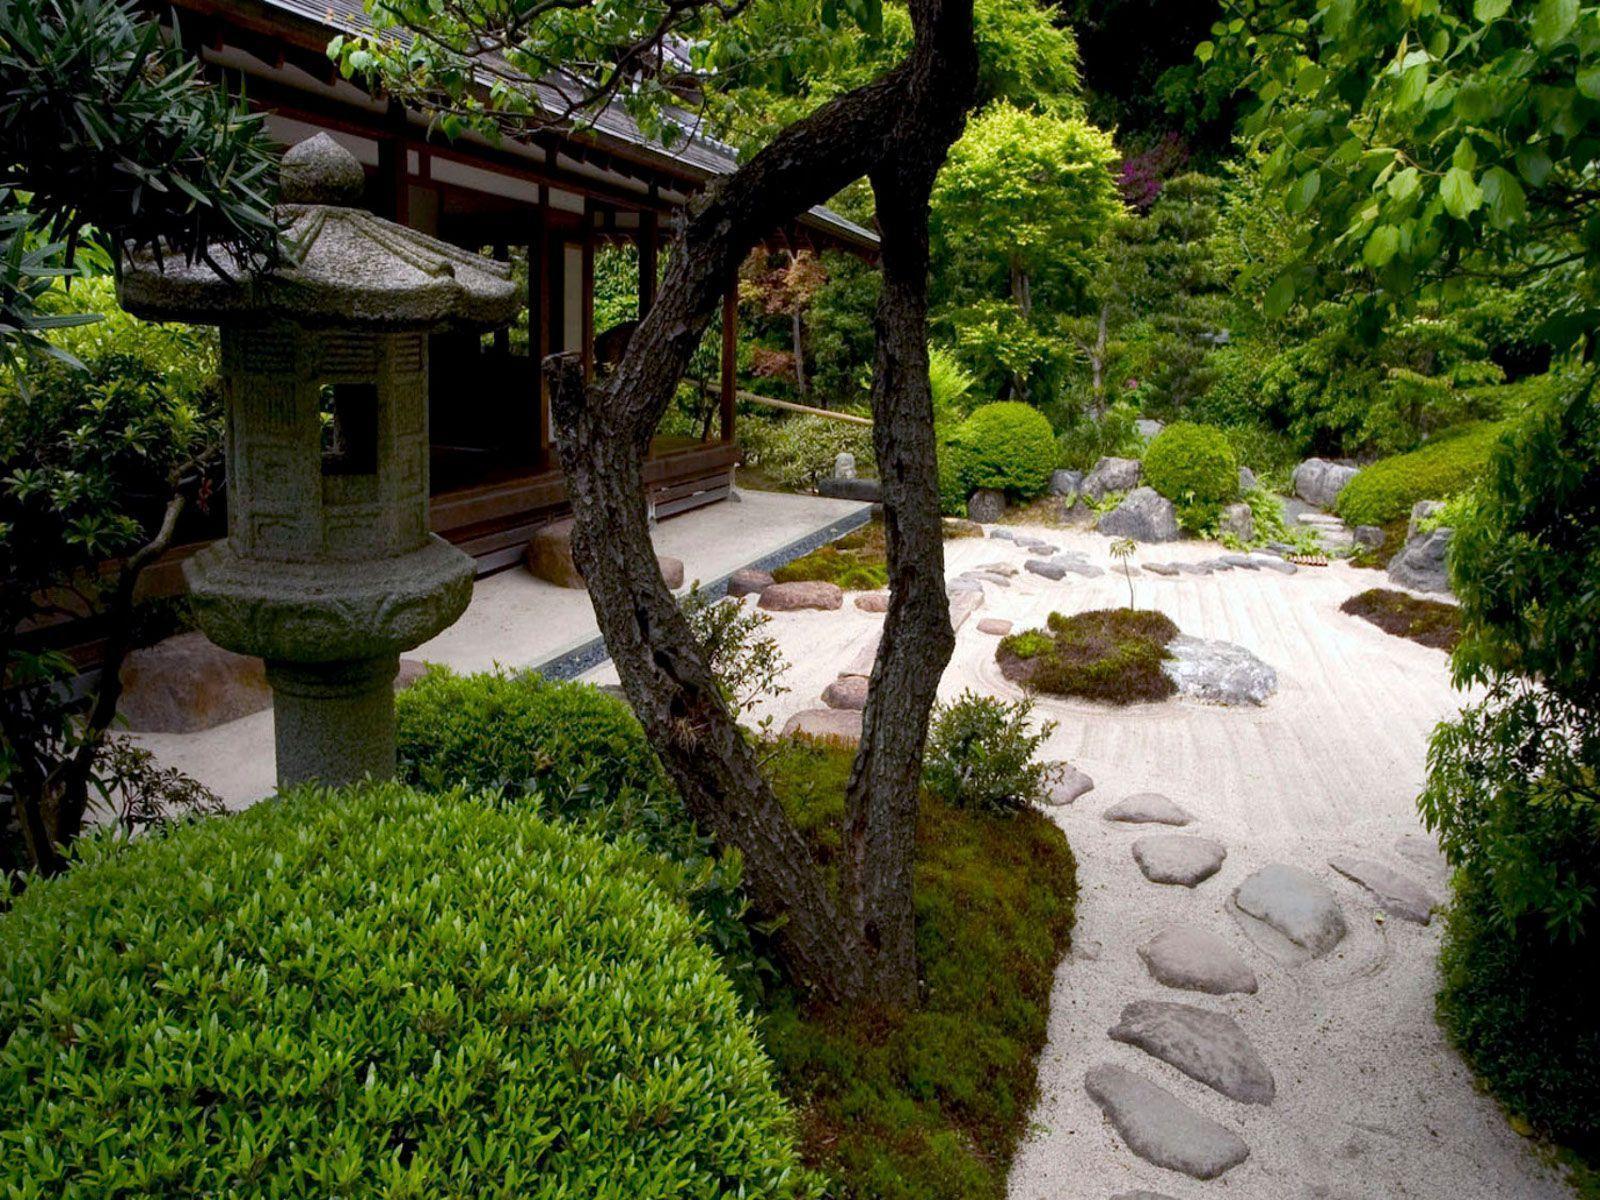 garden wallpaper zen 1920x1080px - photo #1